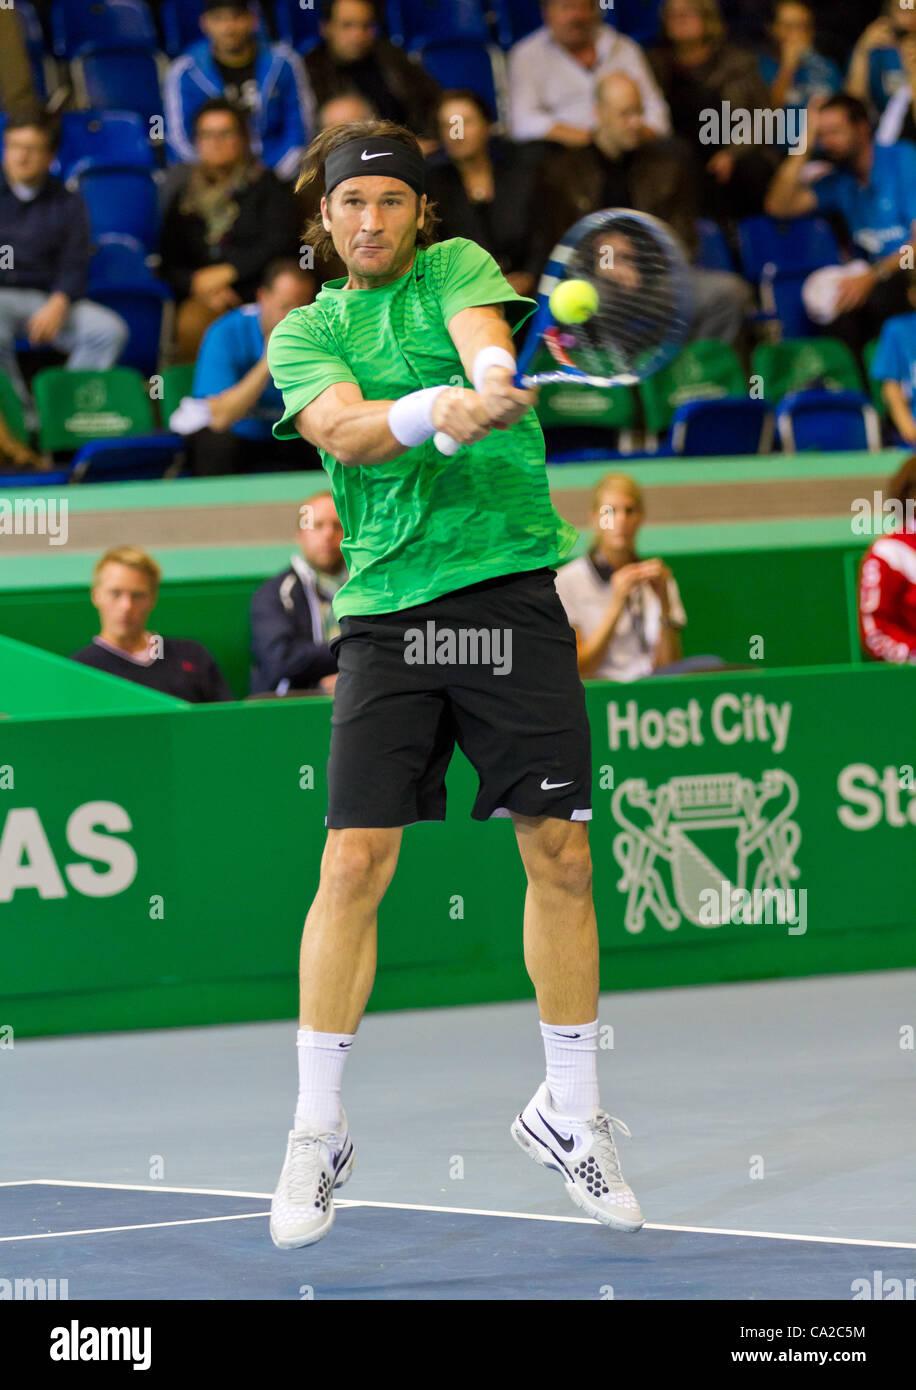 ZURICH, SWITZERLAND-MARCH 24: Carlos Moya plays tennis in final of BNP Paribas Open Champions Tour aganinst Stefan - Stock Image